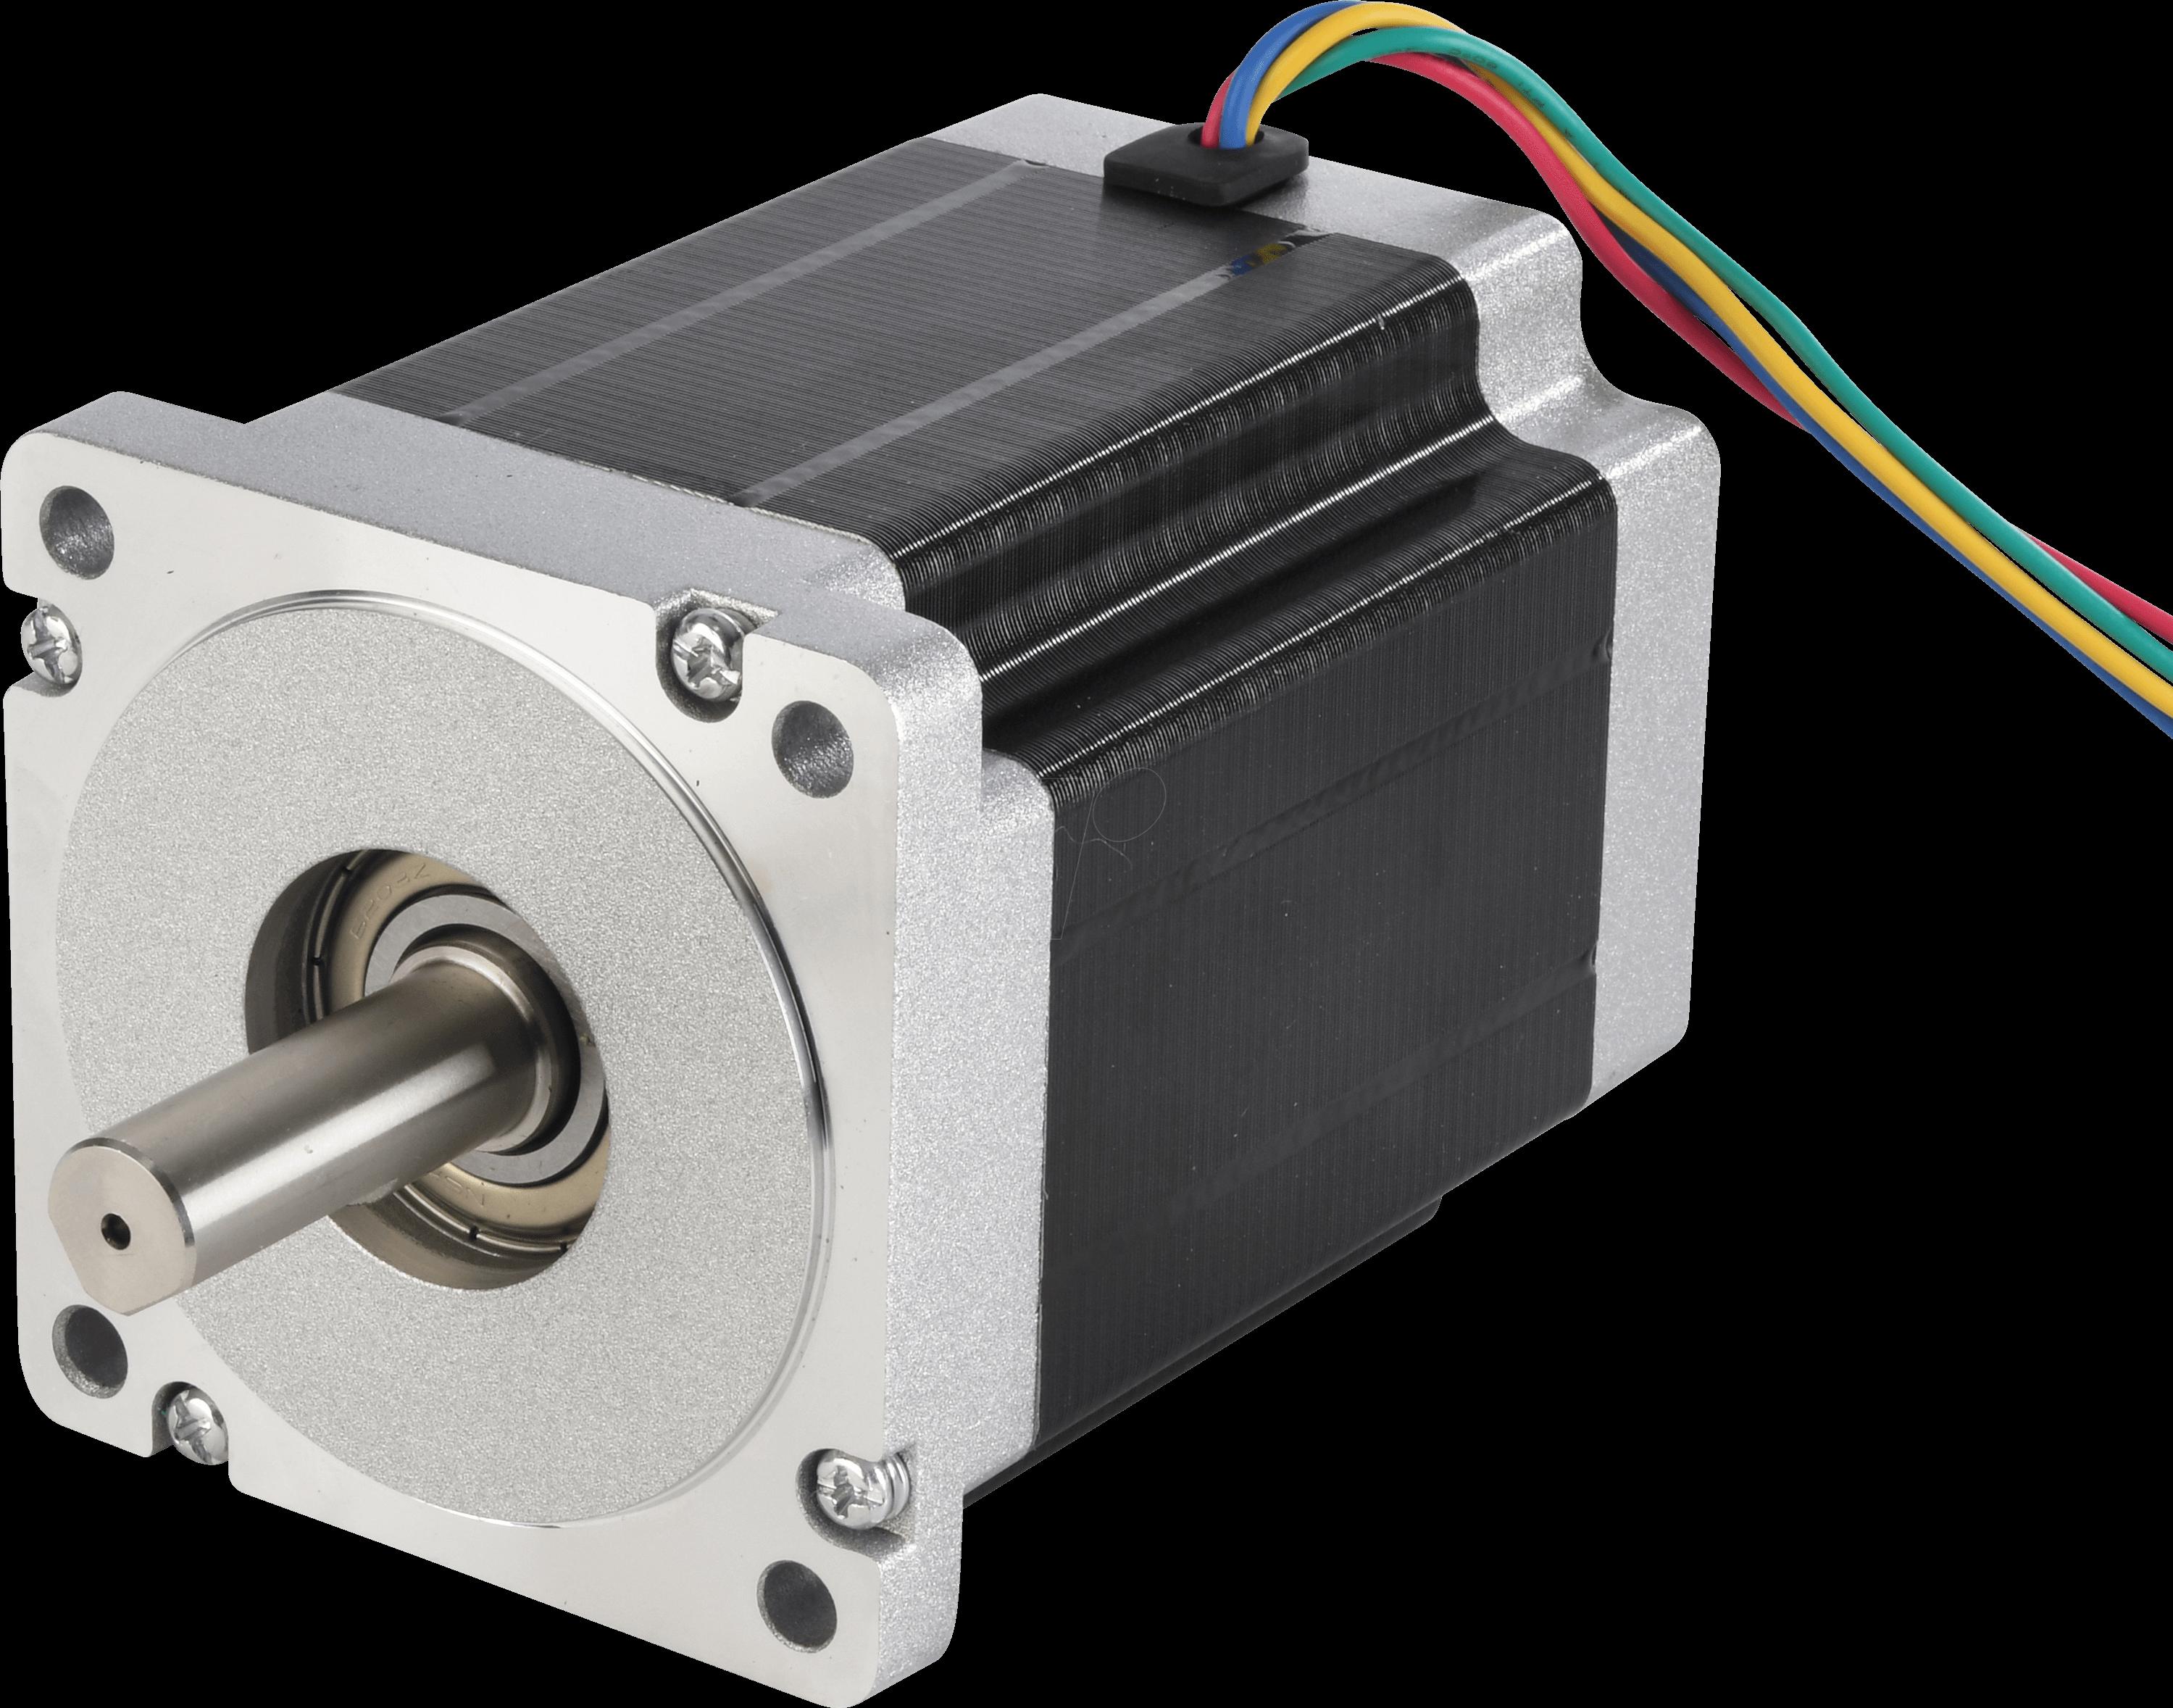 ACT 34HS1456: Hybrid stepper motor NEMA 34, 1.8 °, 5.6 A, 2.8 V at reichelt  elektronik